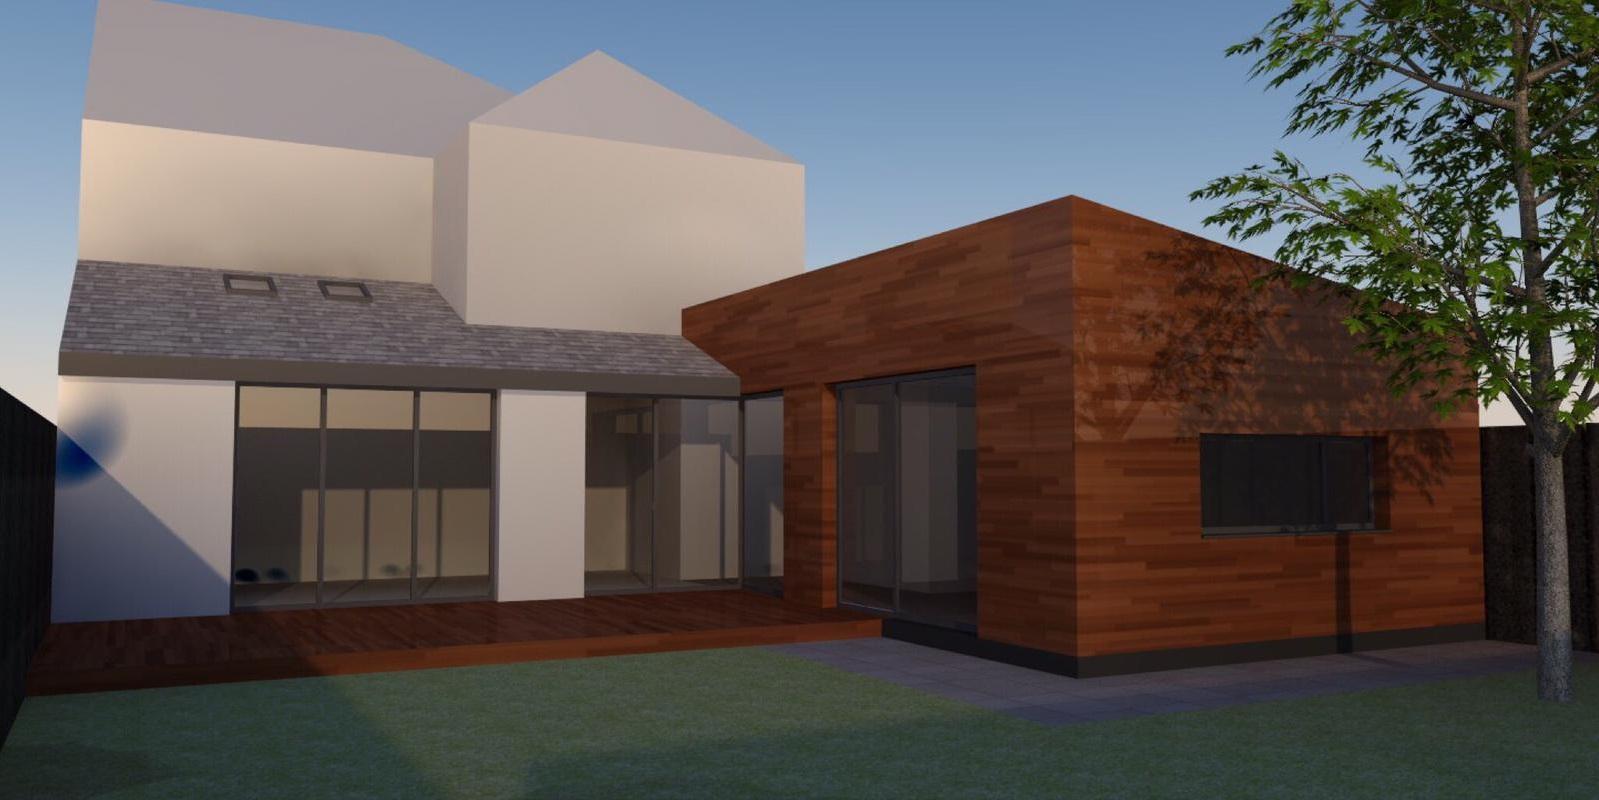 Liverpool Project extension renovation Premier Building Solutions